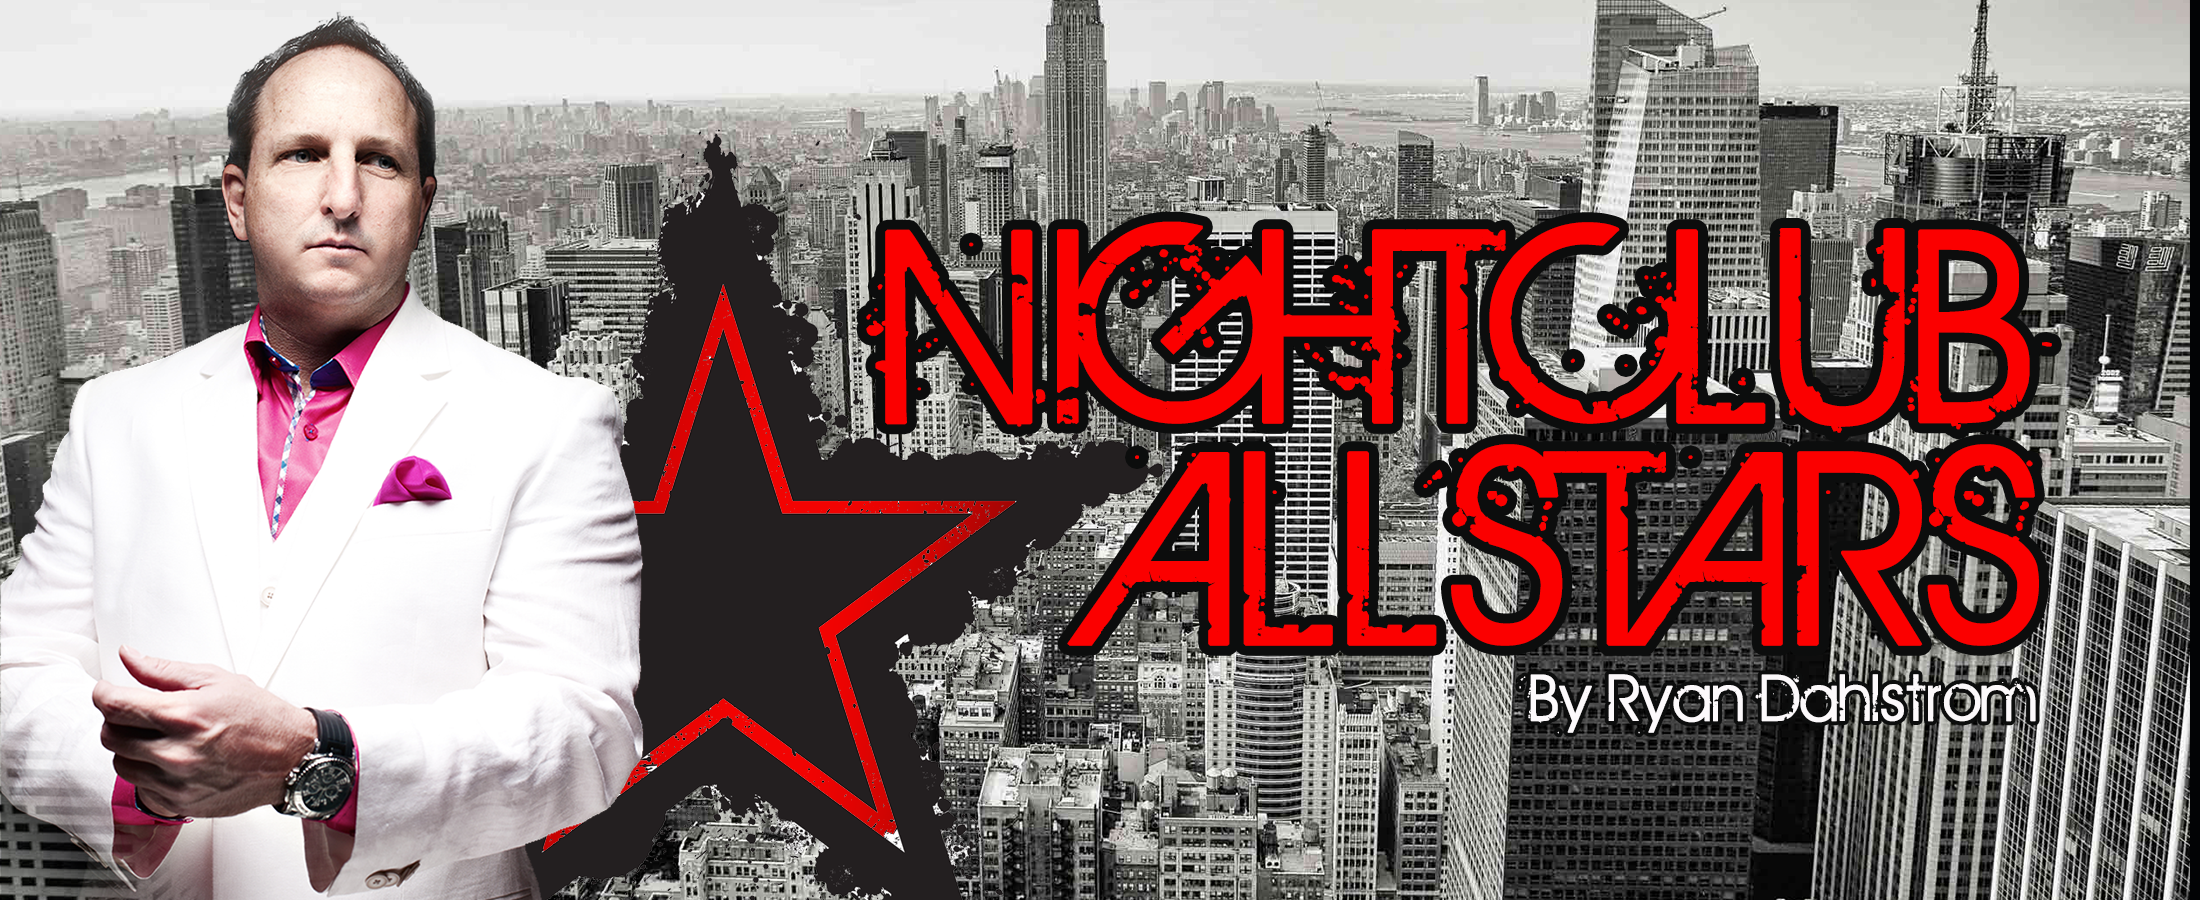 Nightclub All Stars by Ryan Dahlstrom